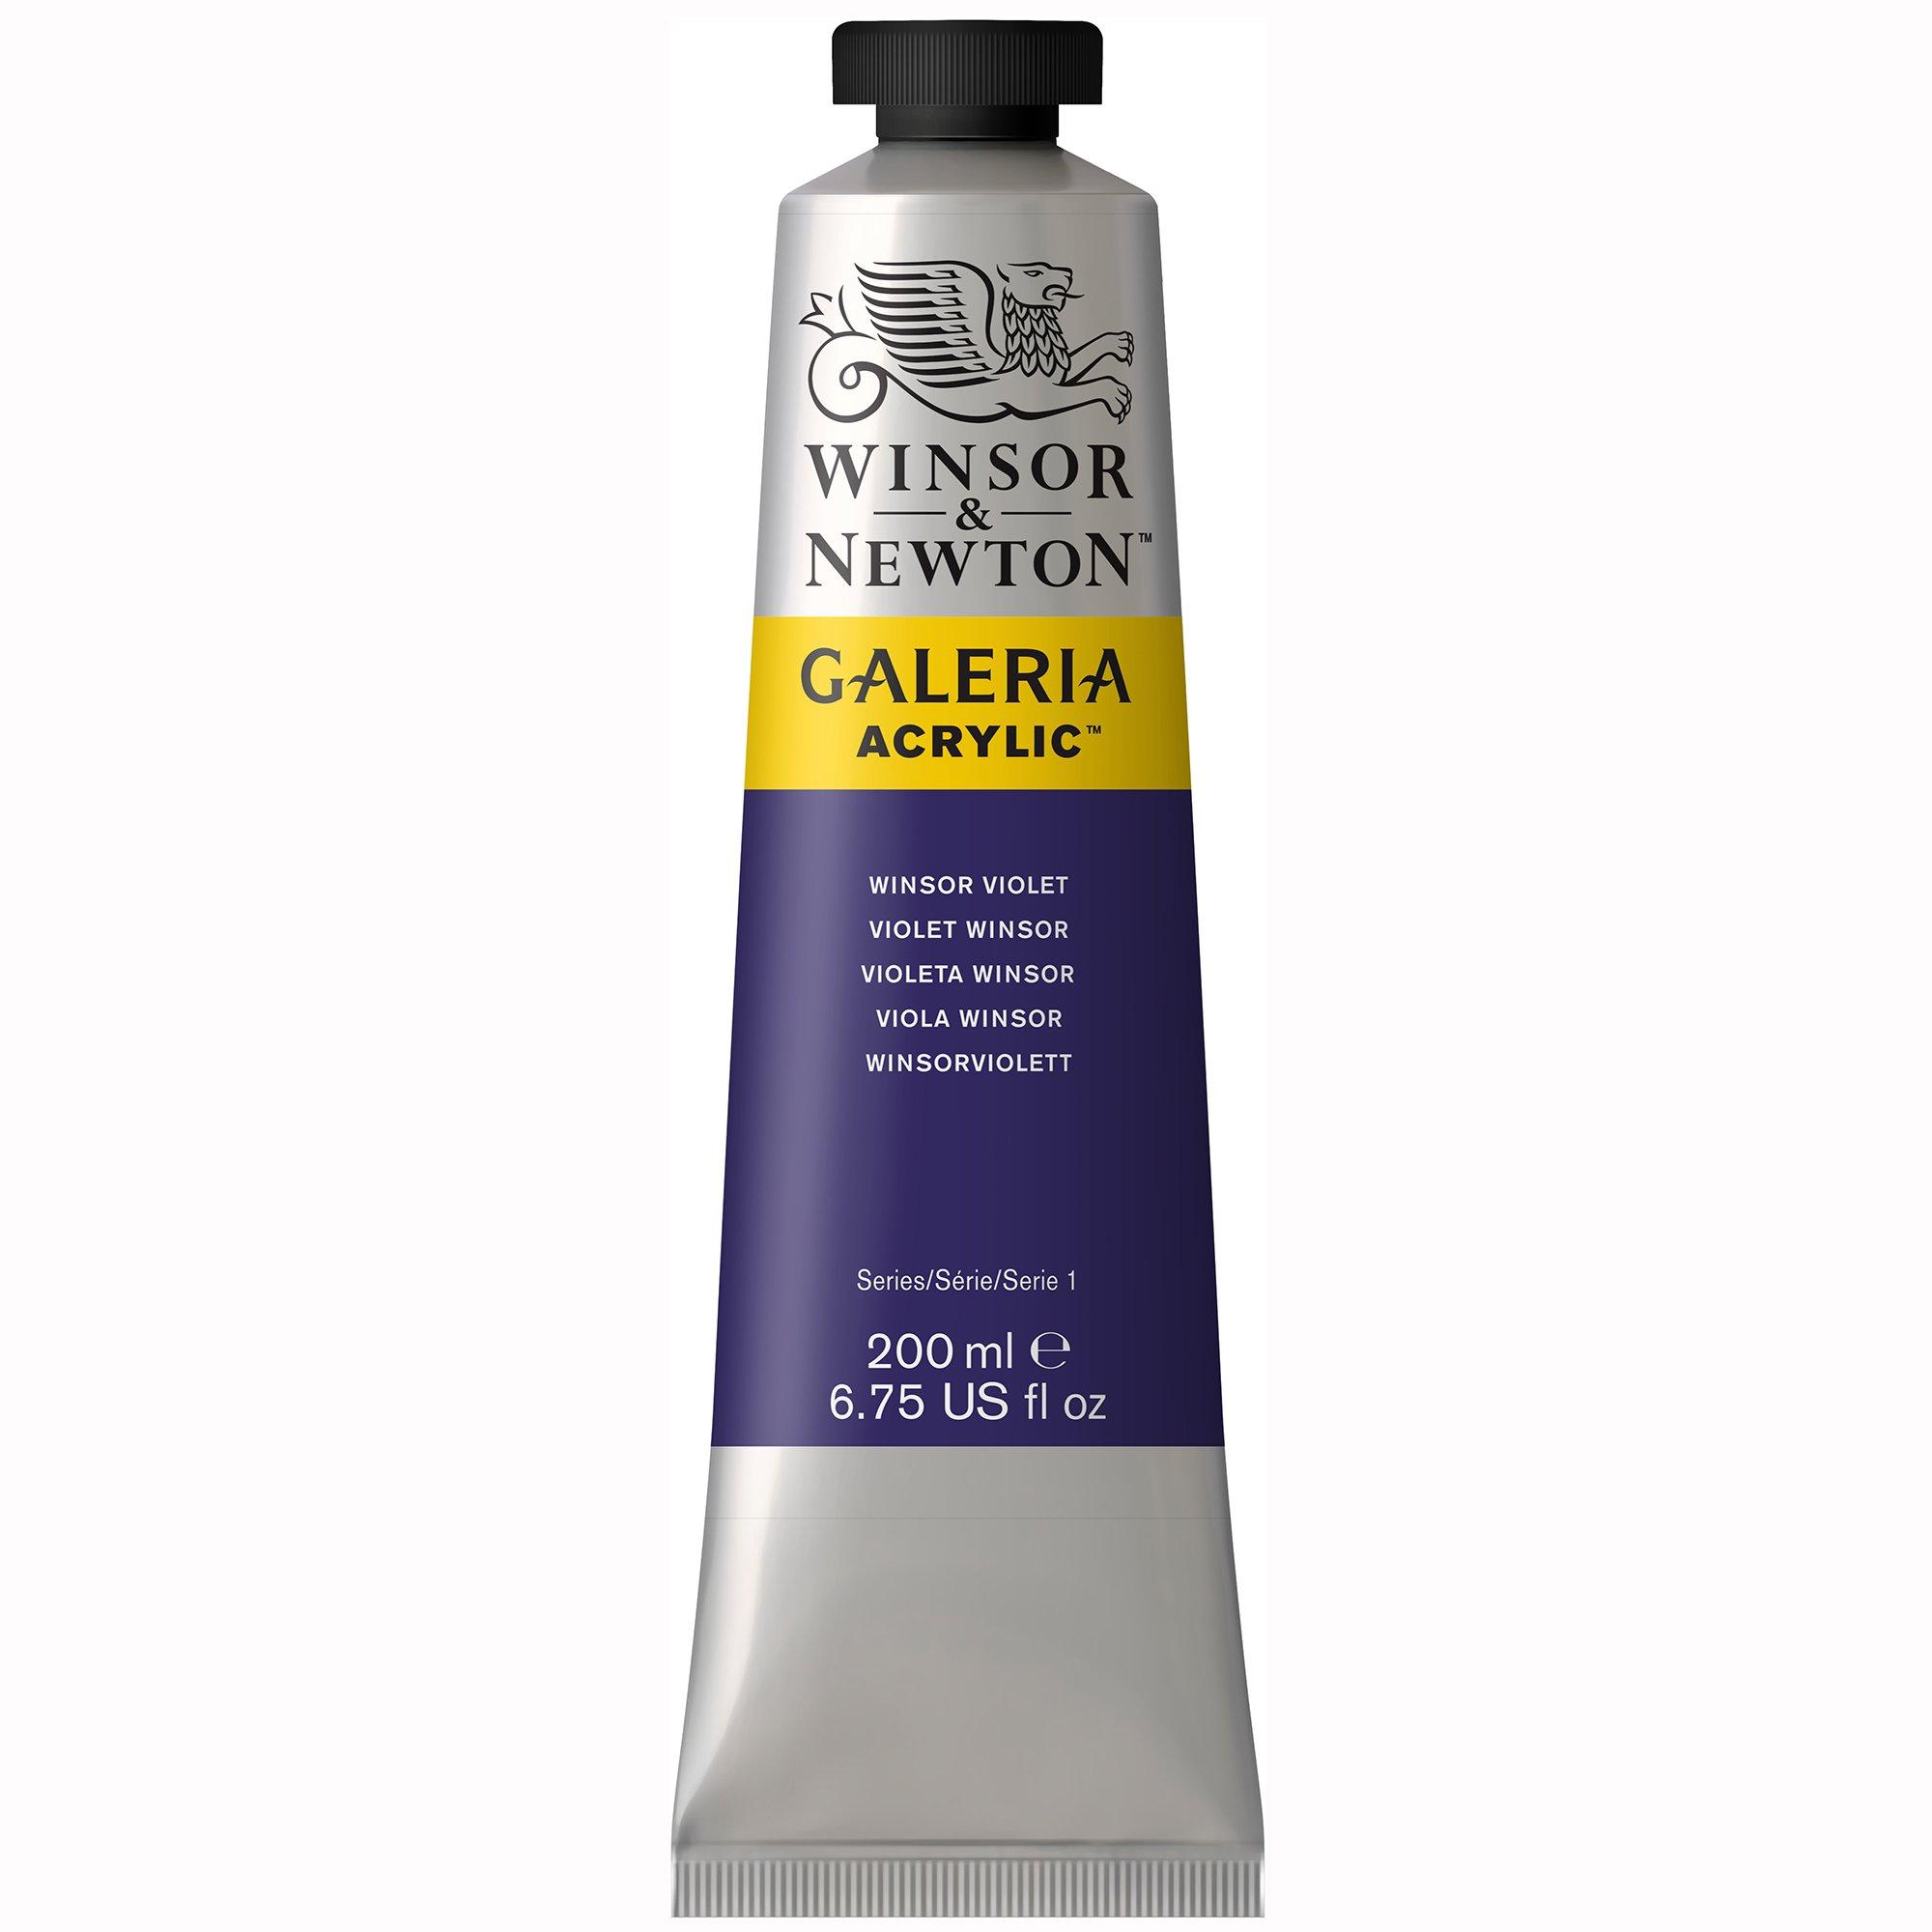 Winsor & Newton Galeria Acrylic Paint, 200ml Tube, Winsor Violet